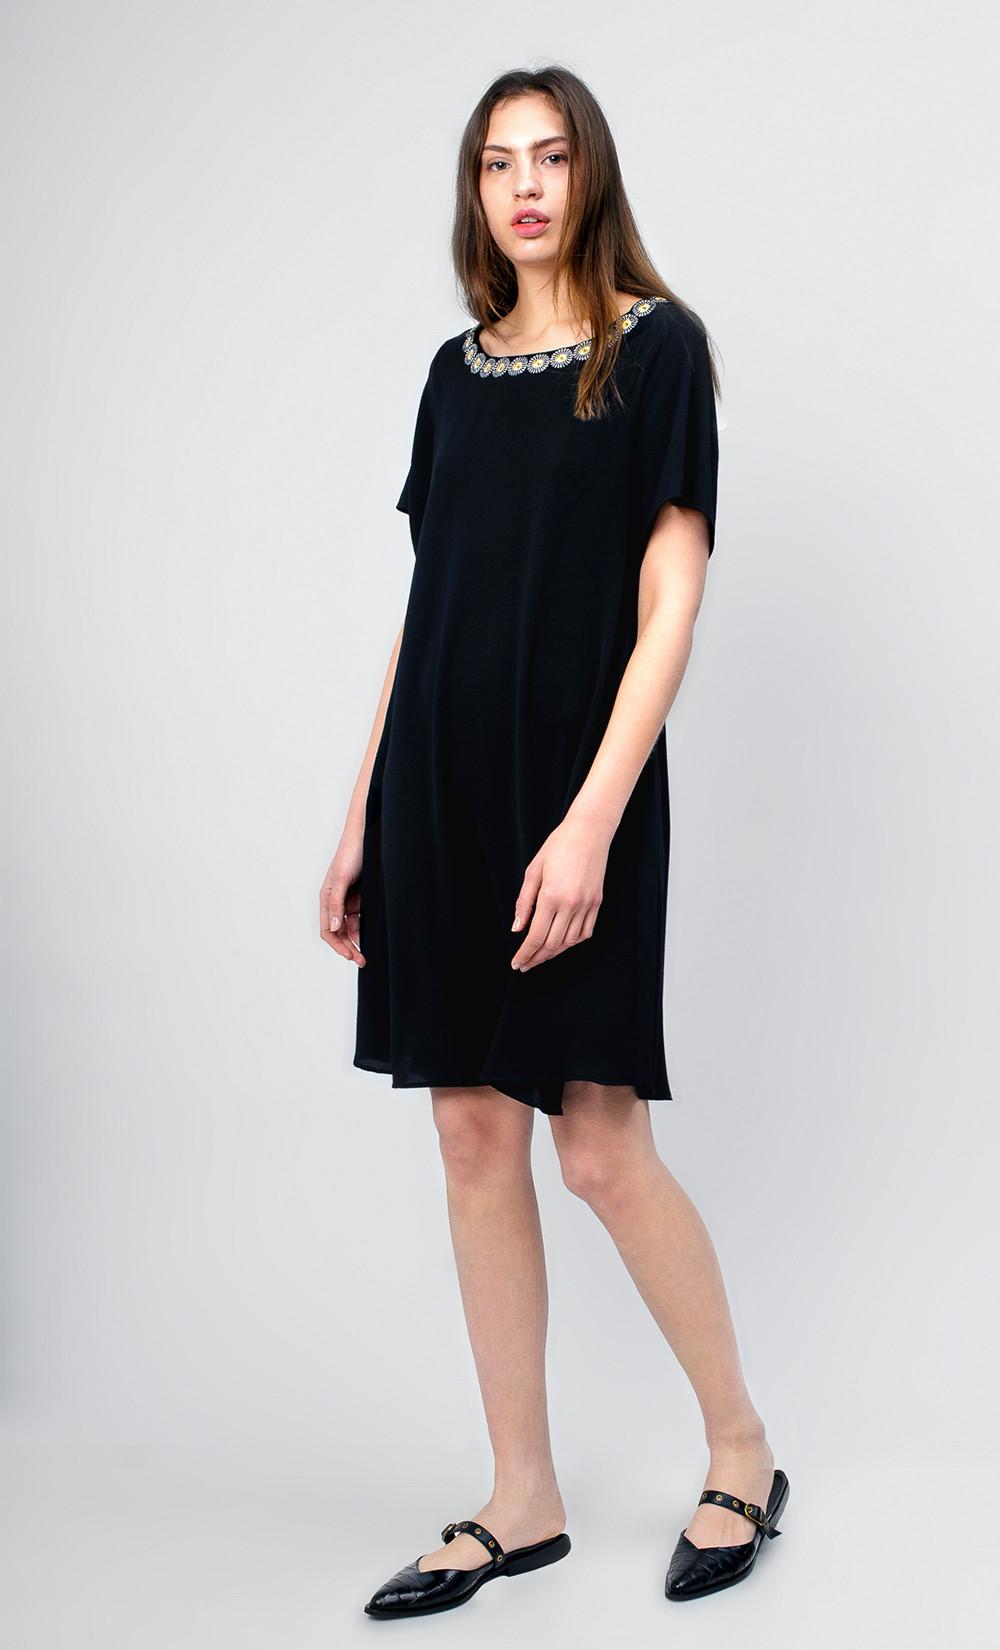 Sistera Dress